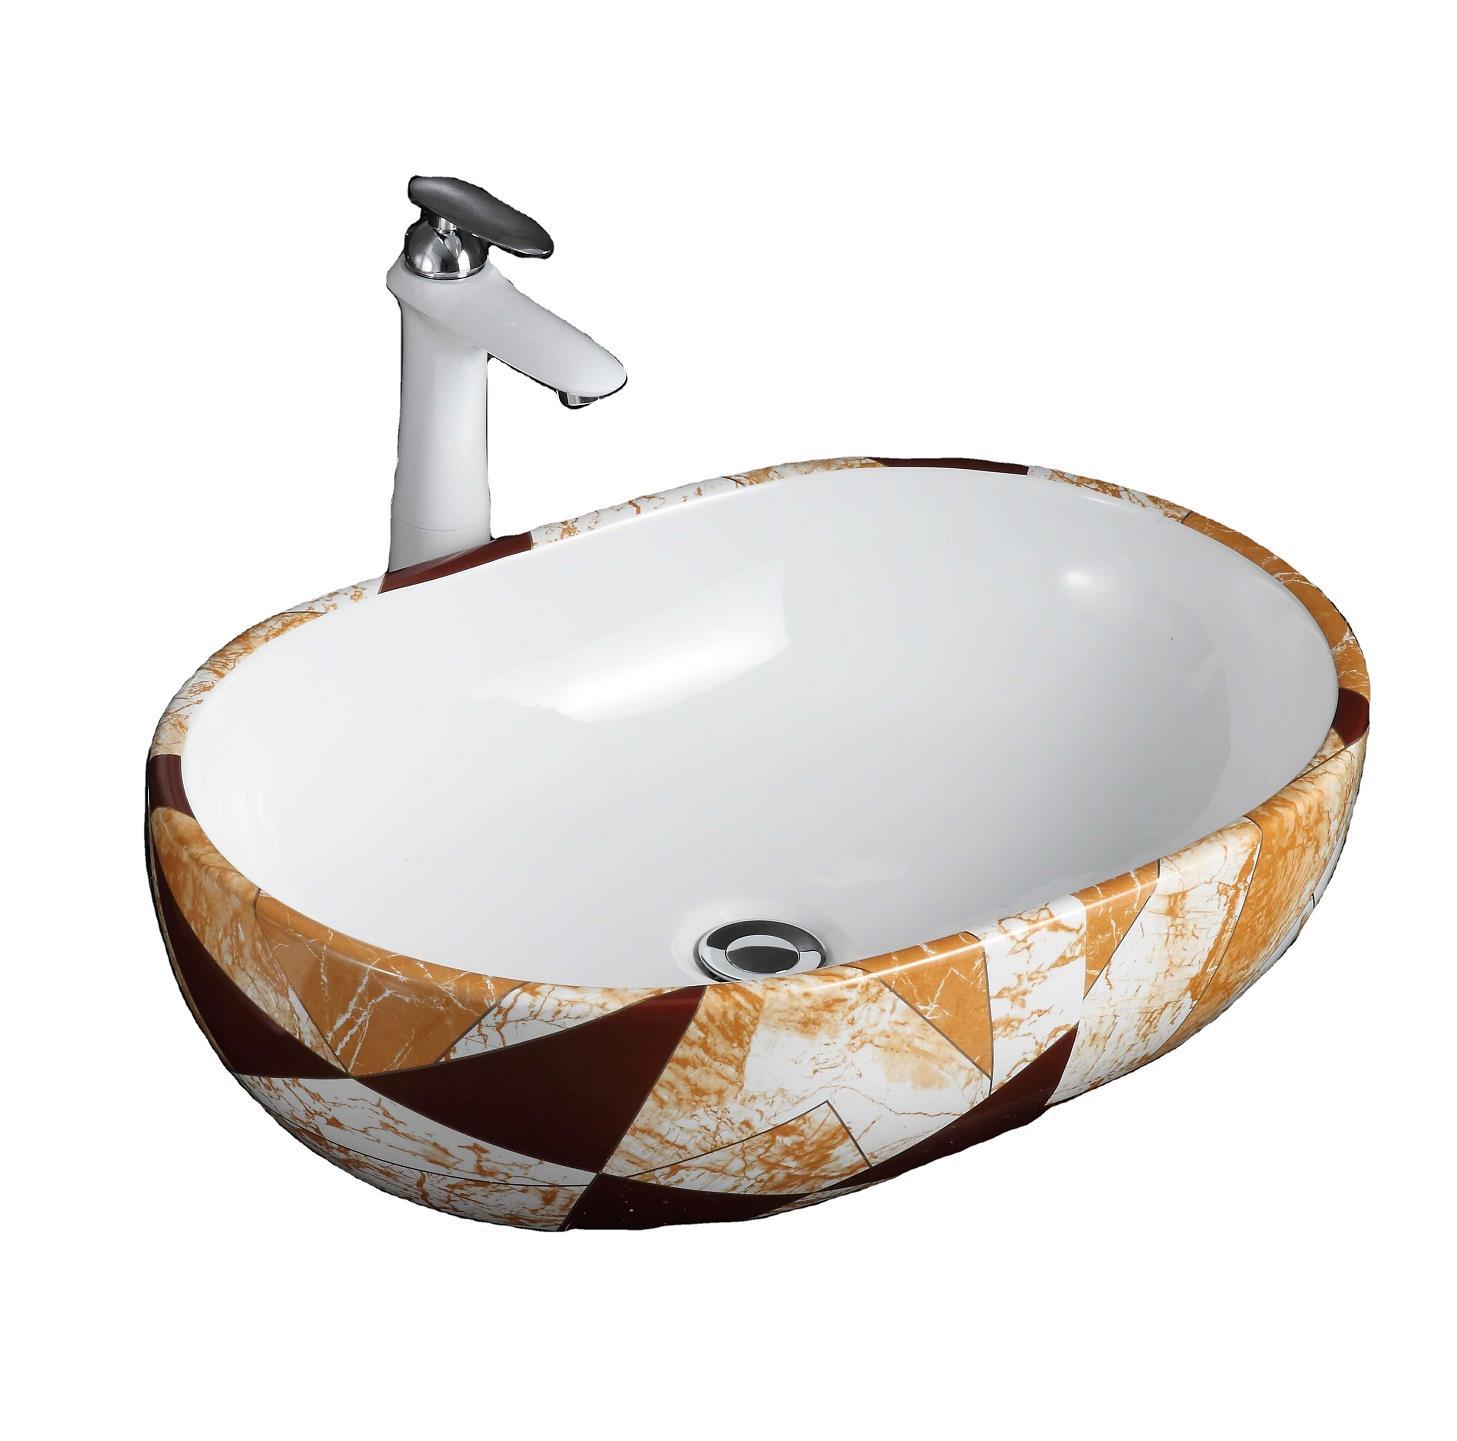 5012bp High quality wholesale modern fashion ceramic bathroom sink black water drop pattern design art basin